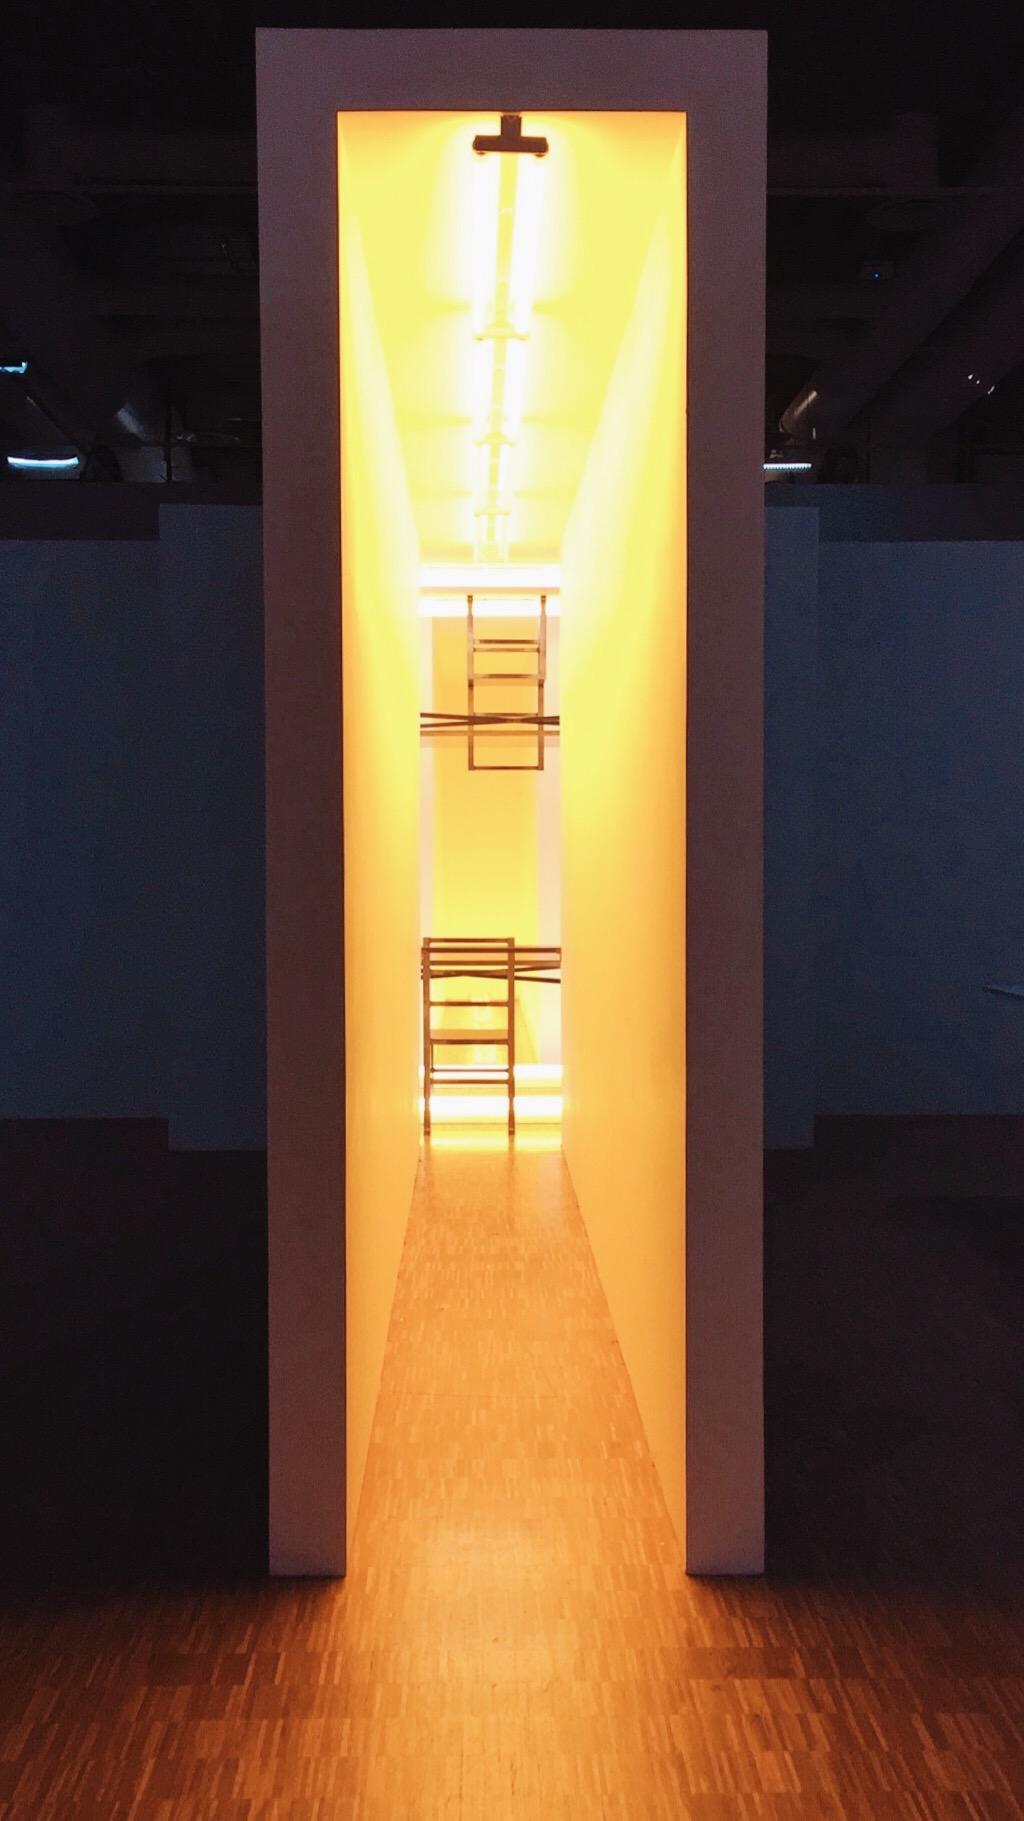 Bruce Nauman,  Dream Passage with Four Corridors